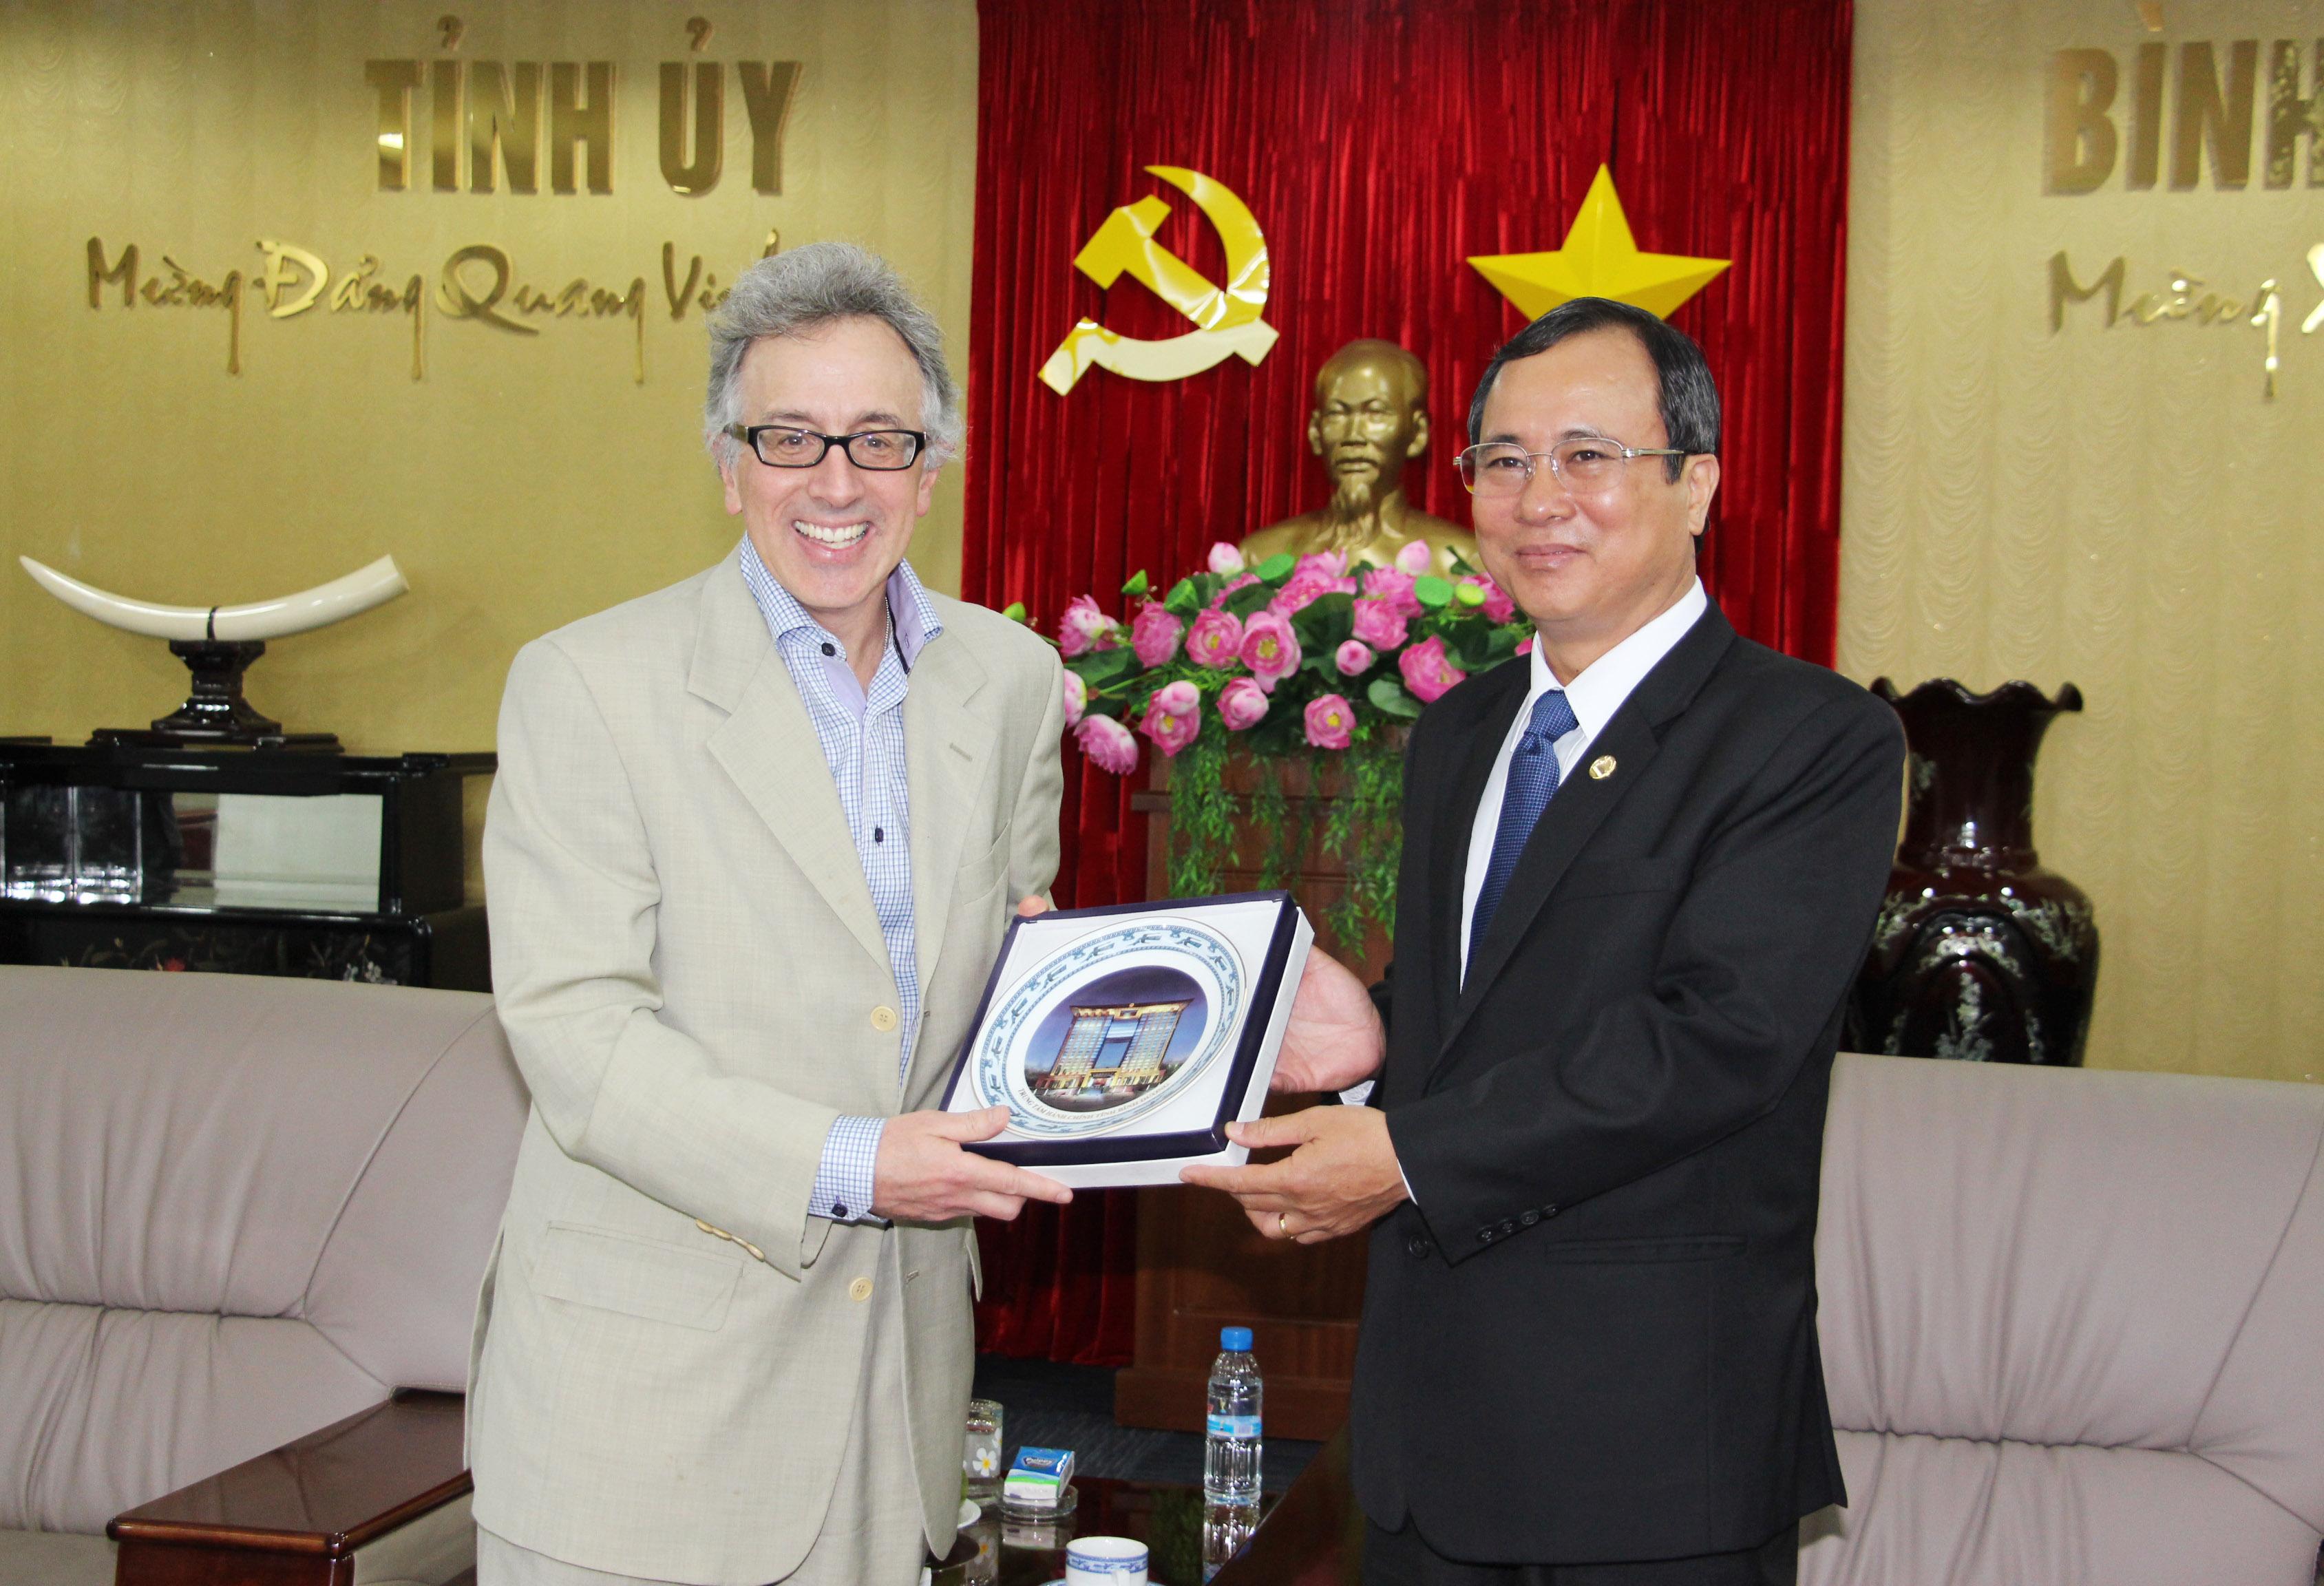 Binh_Duong_2016_(Central_Committee_Chairman___LAZ).jpg